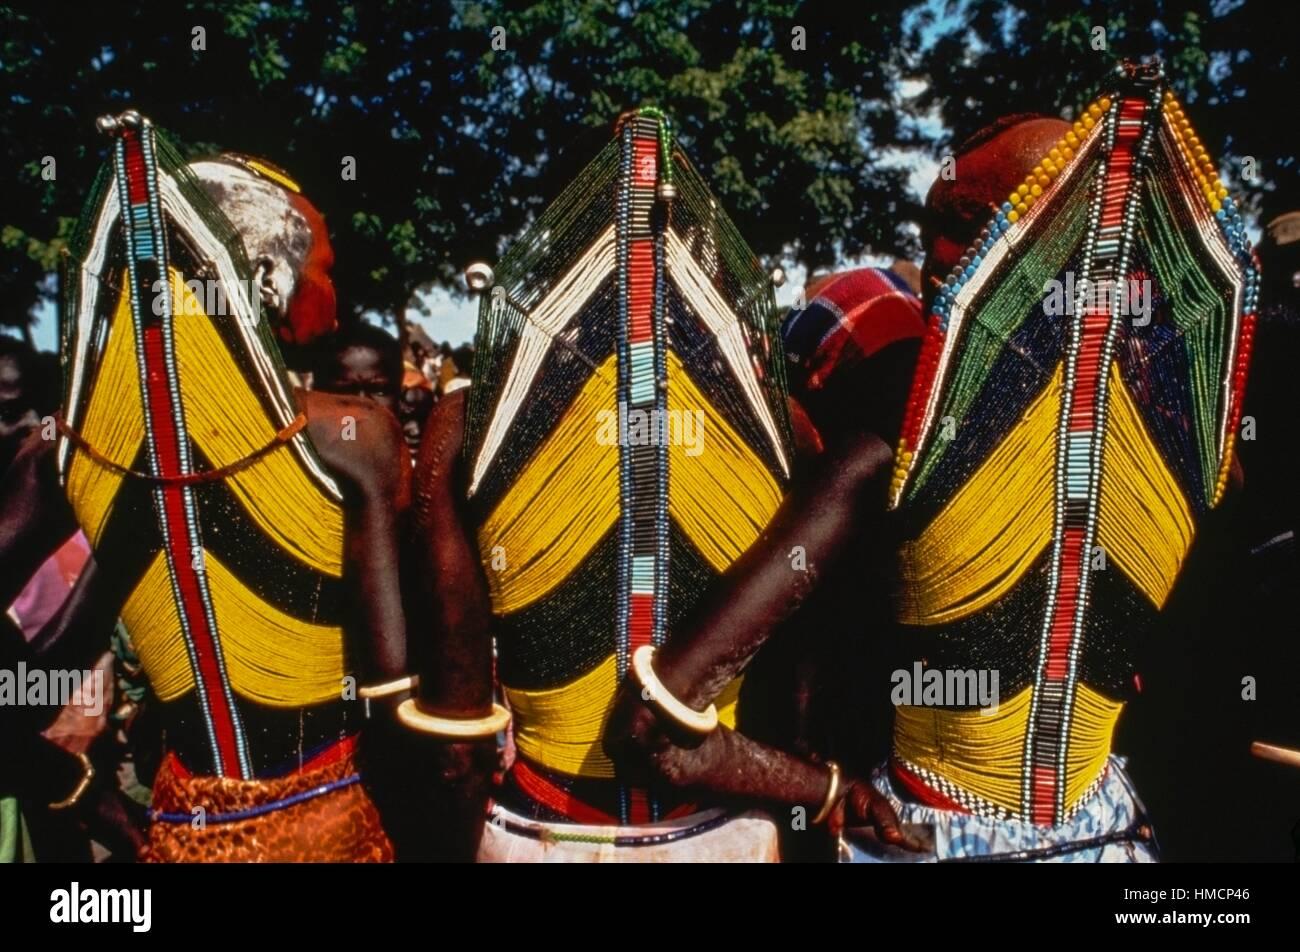 Three members of the Dinka tribe wearing ritual robes, Kordofan, South Sudan. - Stock Image